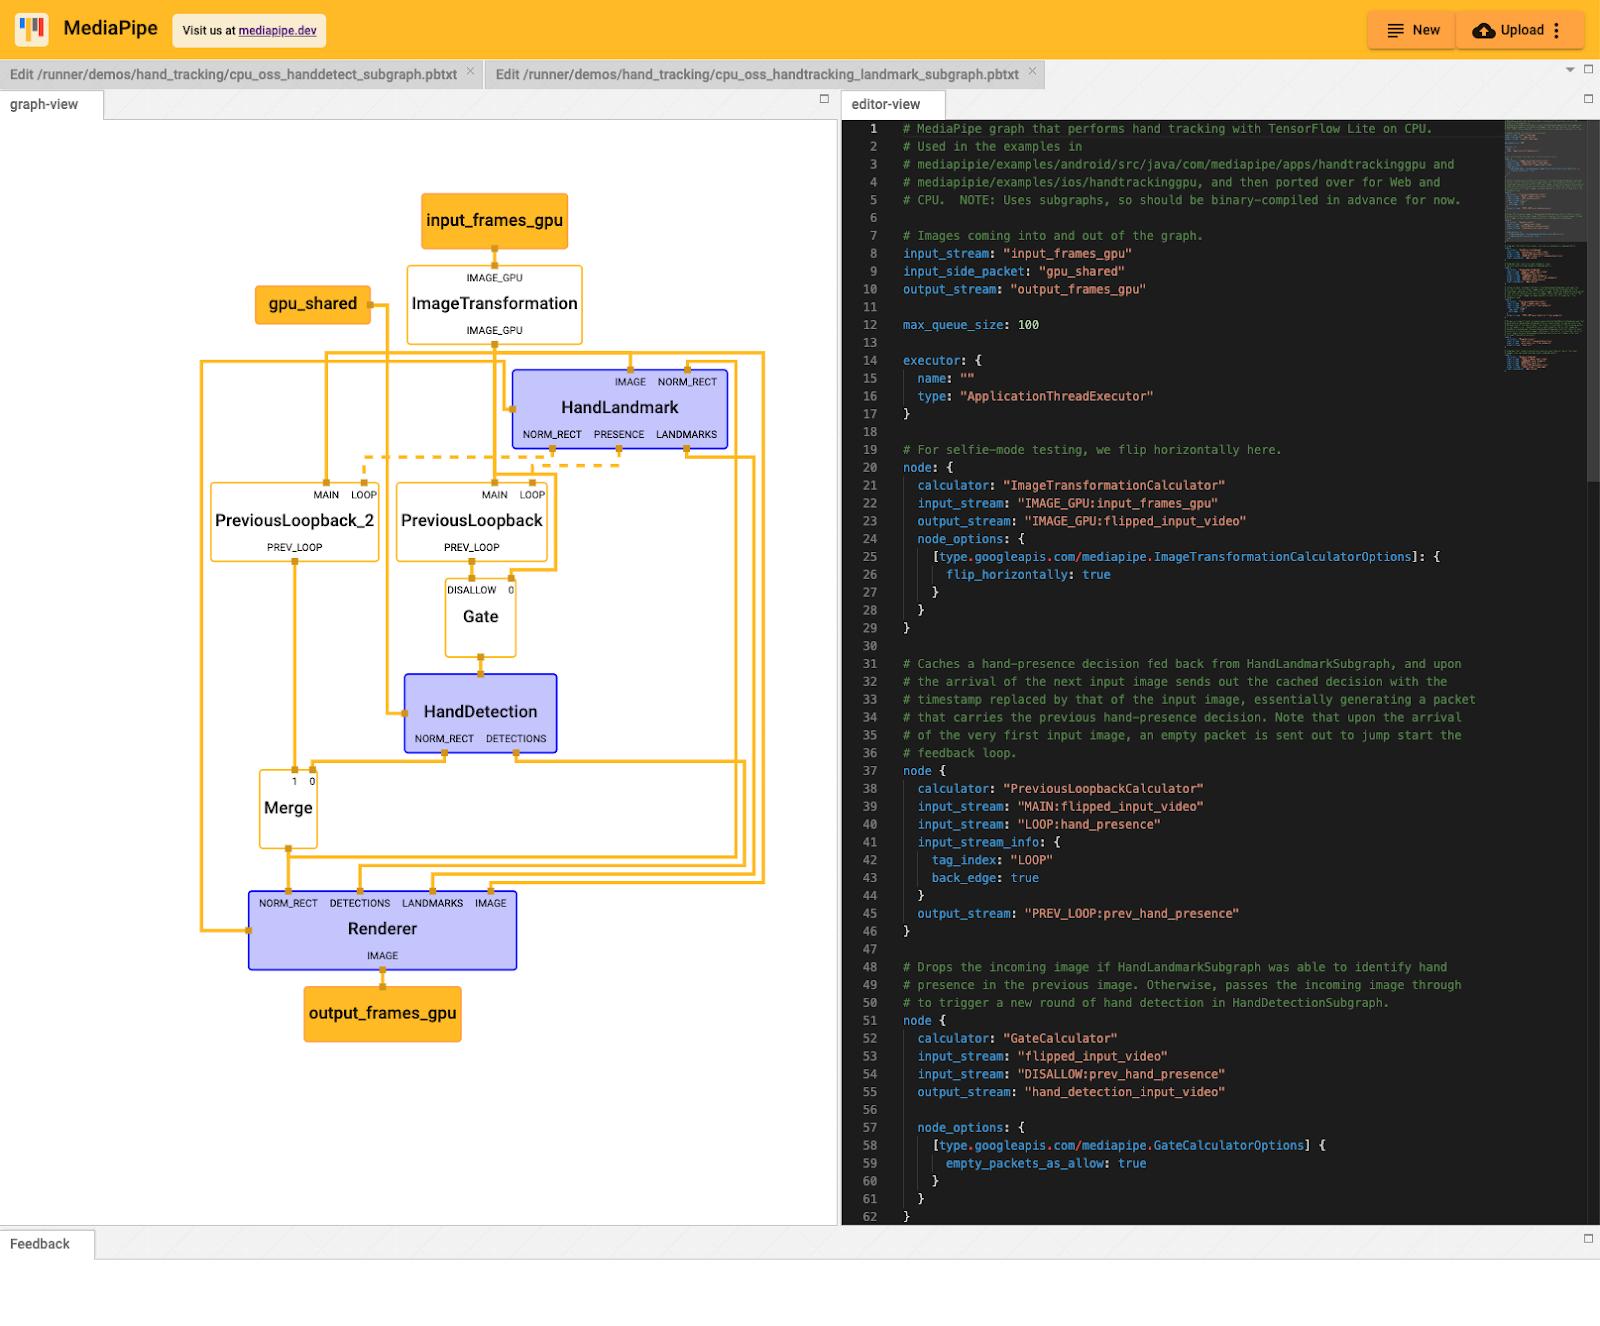 MediaPipe Visualizer hosted at https://viz.mediapipe.dev